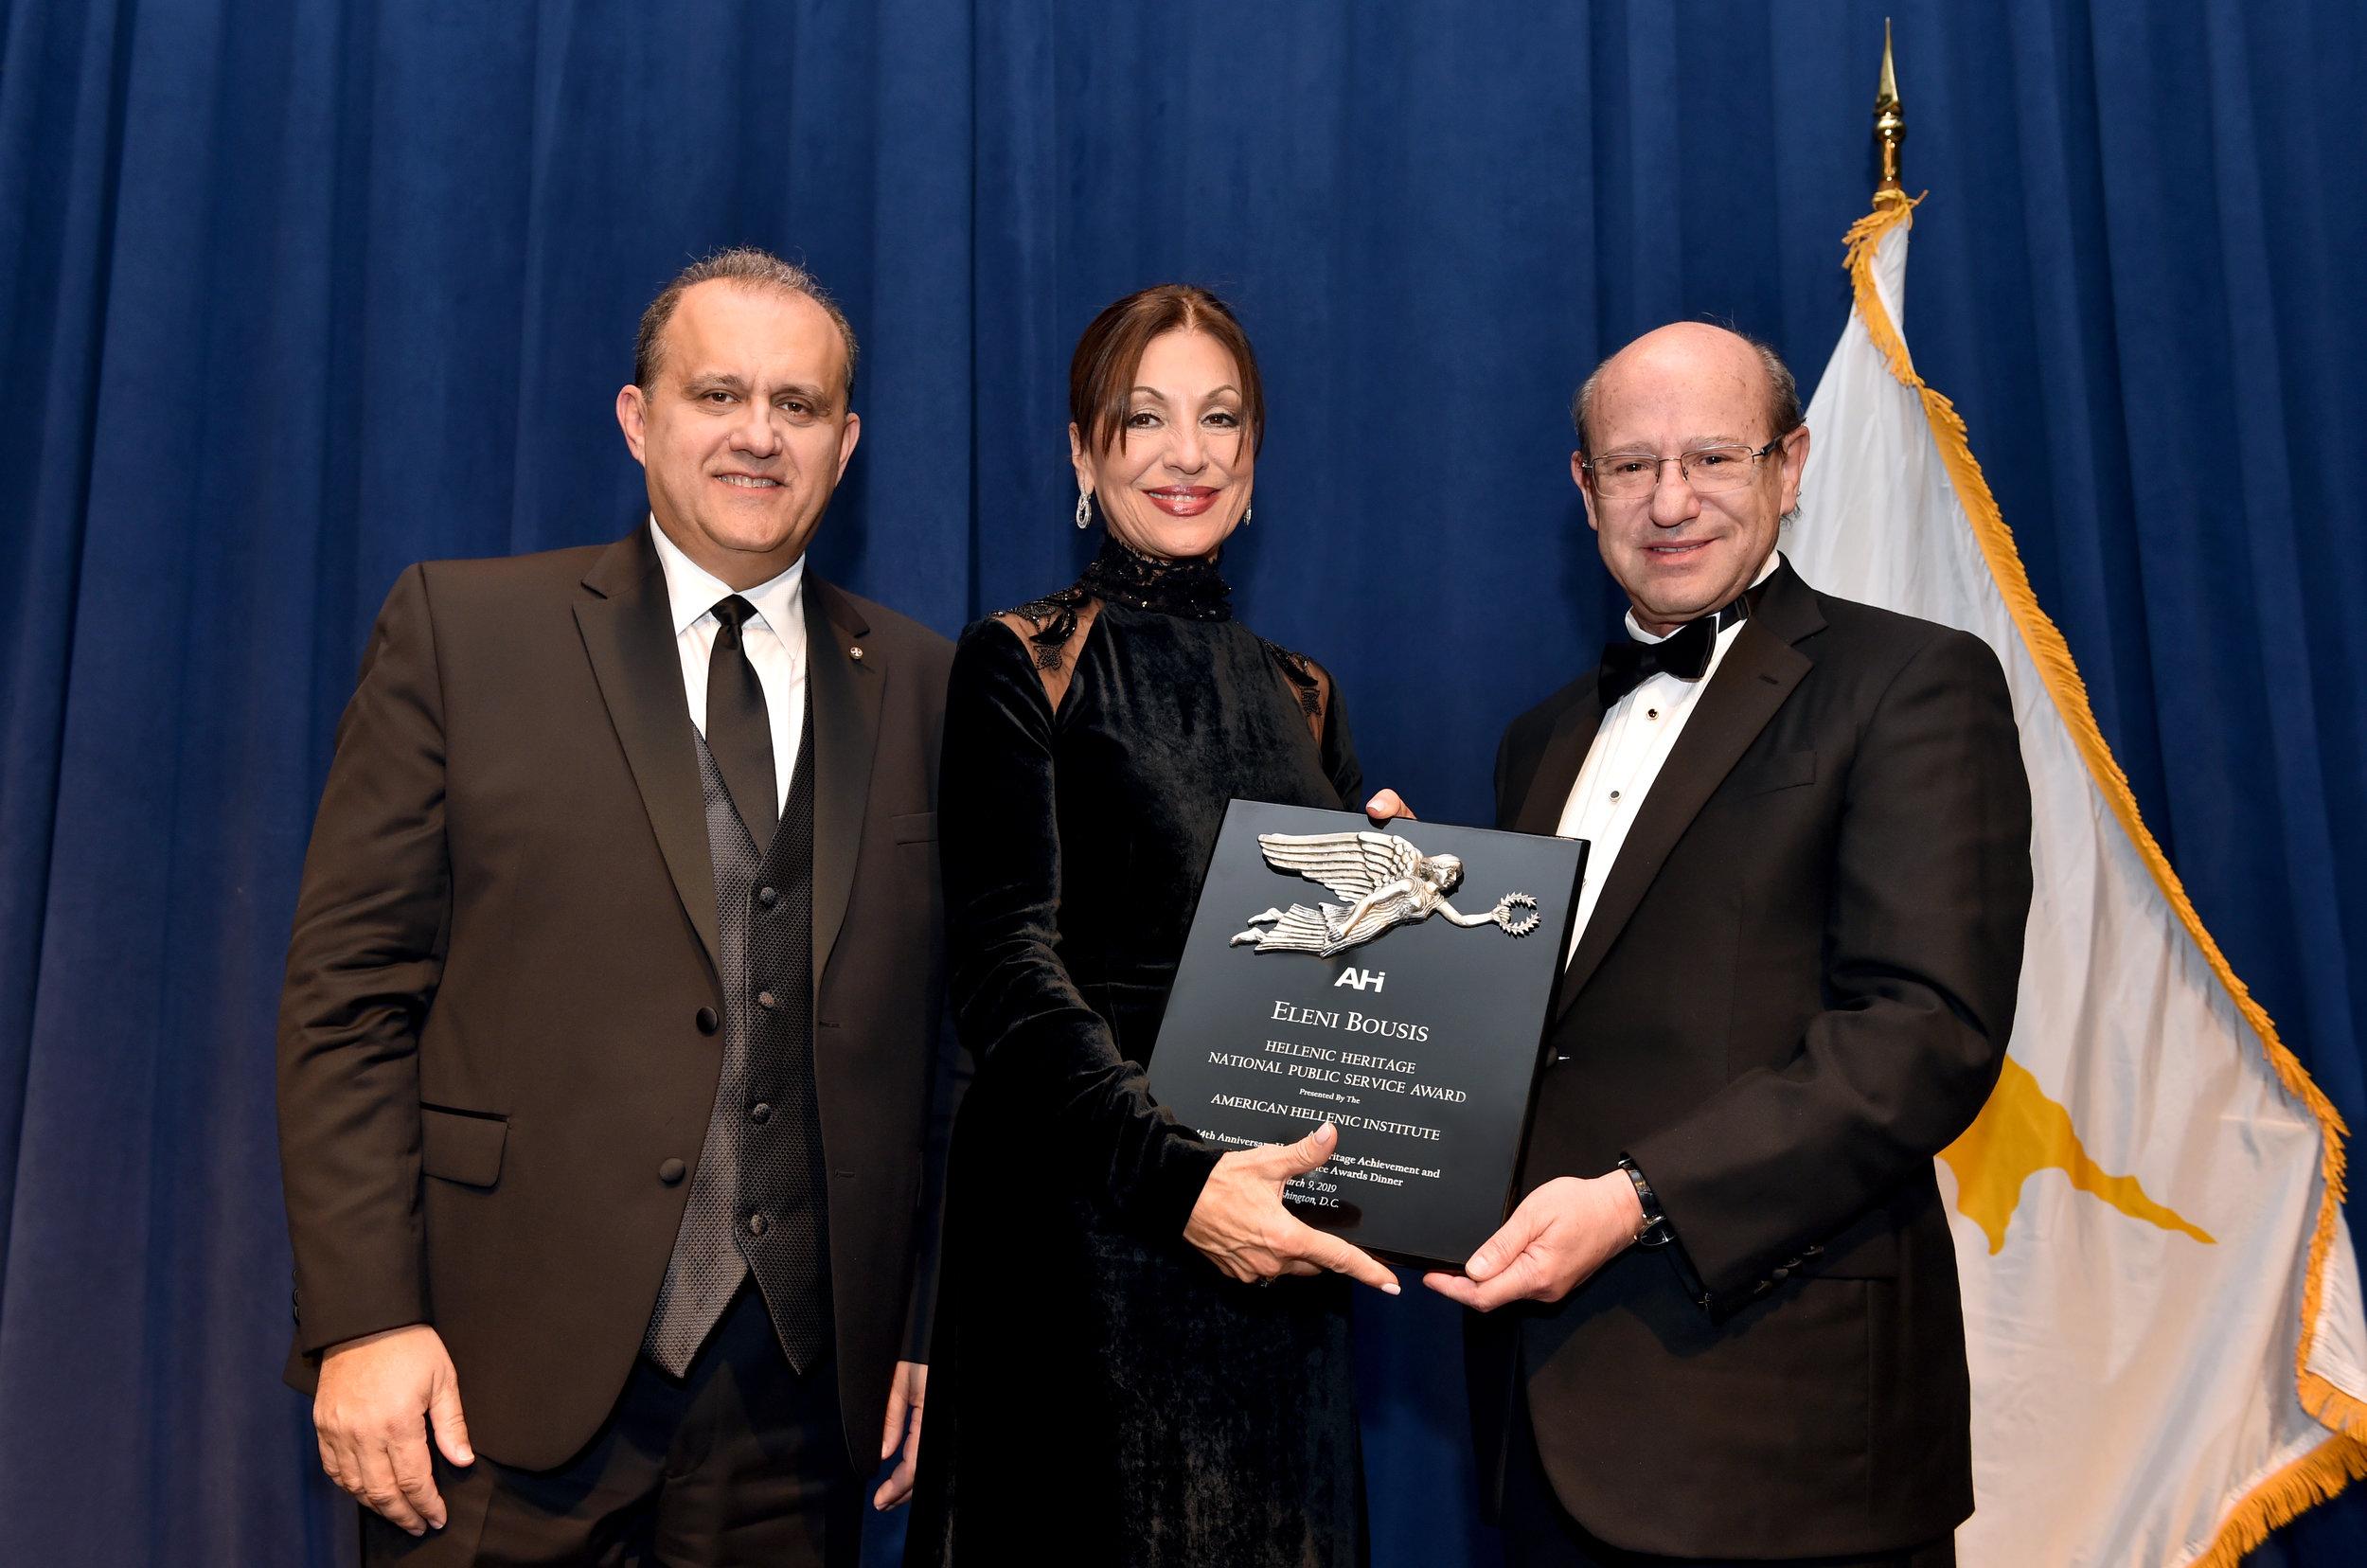 Eleni Bousis receiving the award from Nick Larigakis and Costas Galanis